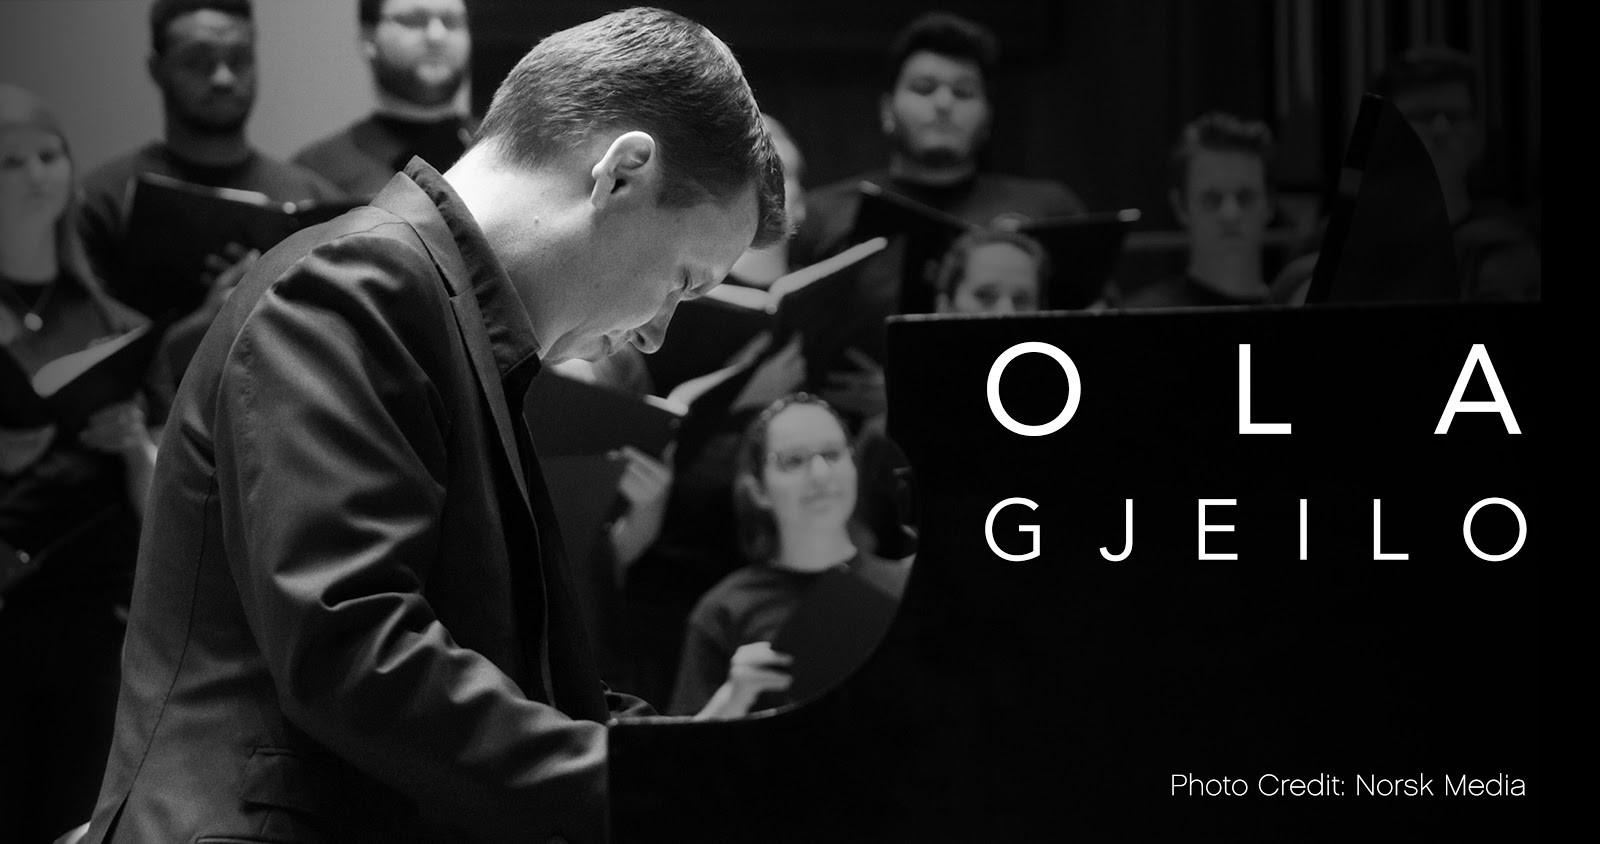 Featured Composer: Ola Gjeilo